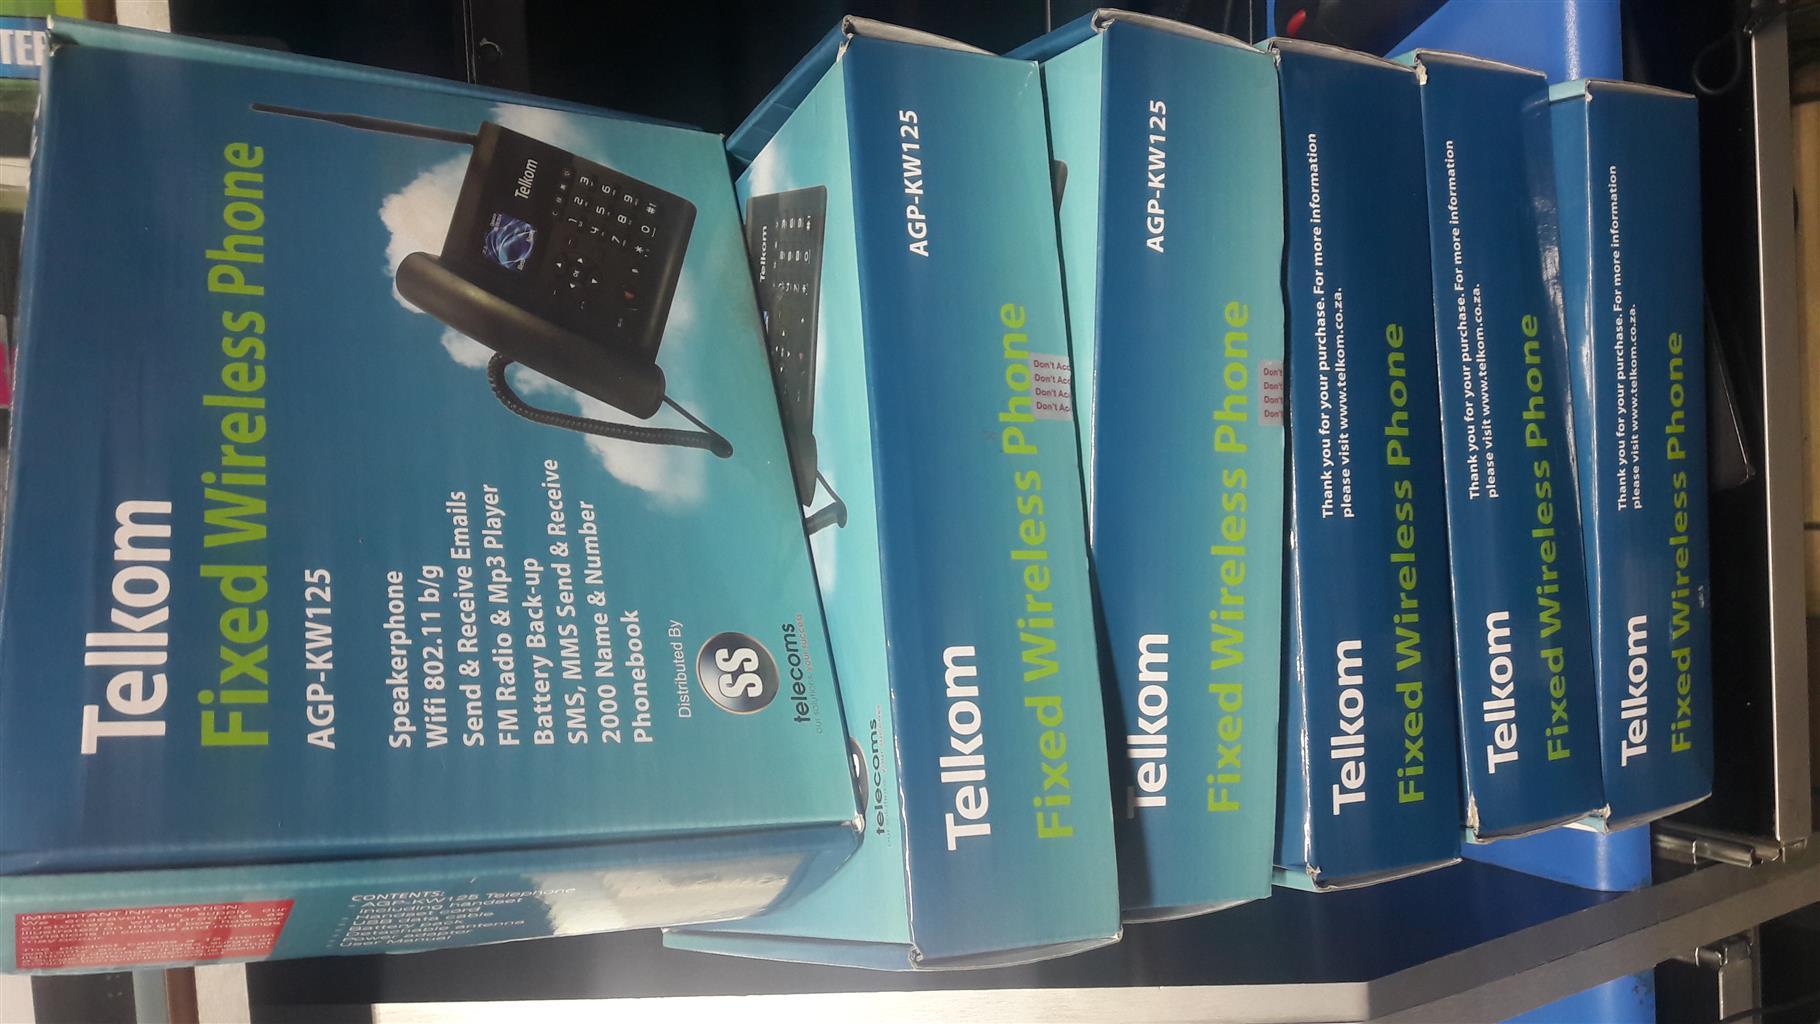 Telkom Fixed Wireless Phone AGP-KW125, With WIFI, Very Very Cheap